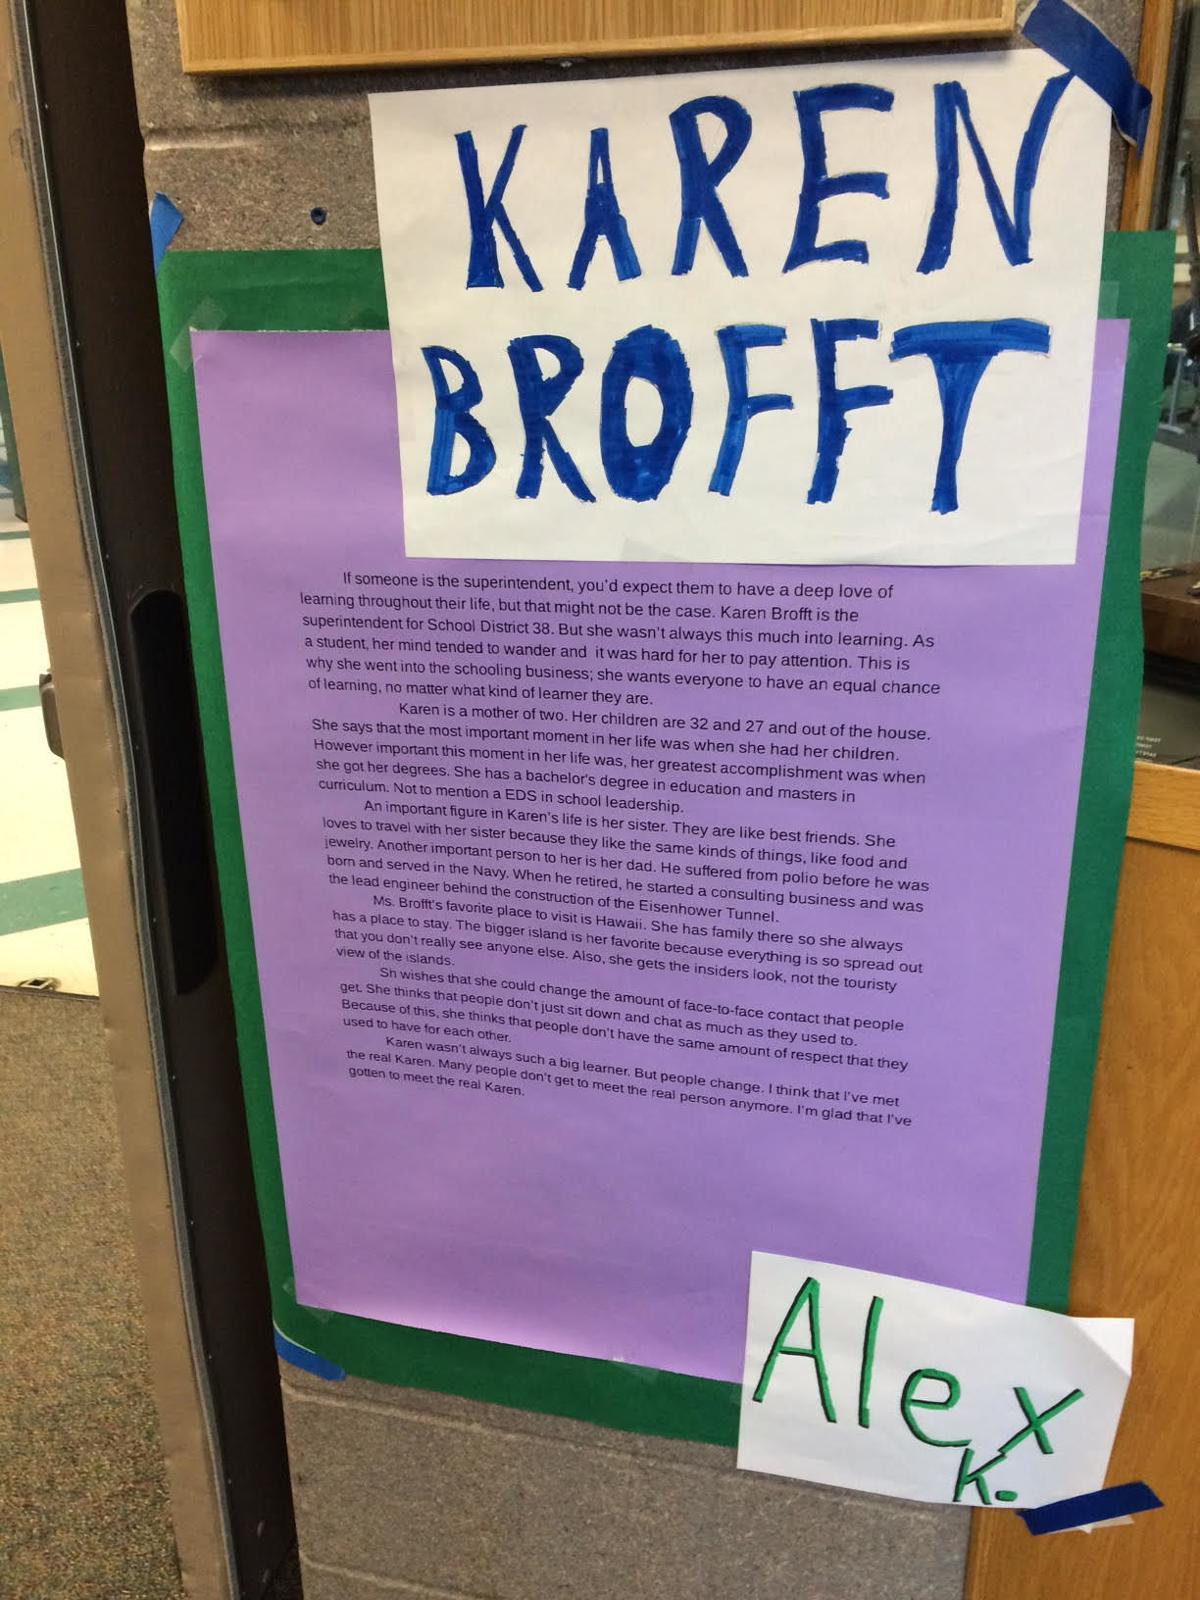 District 38 Superintendent Karen Brofft